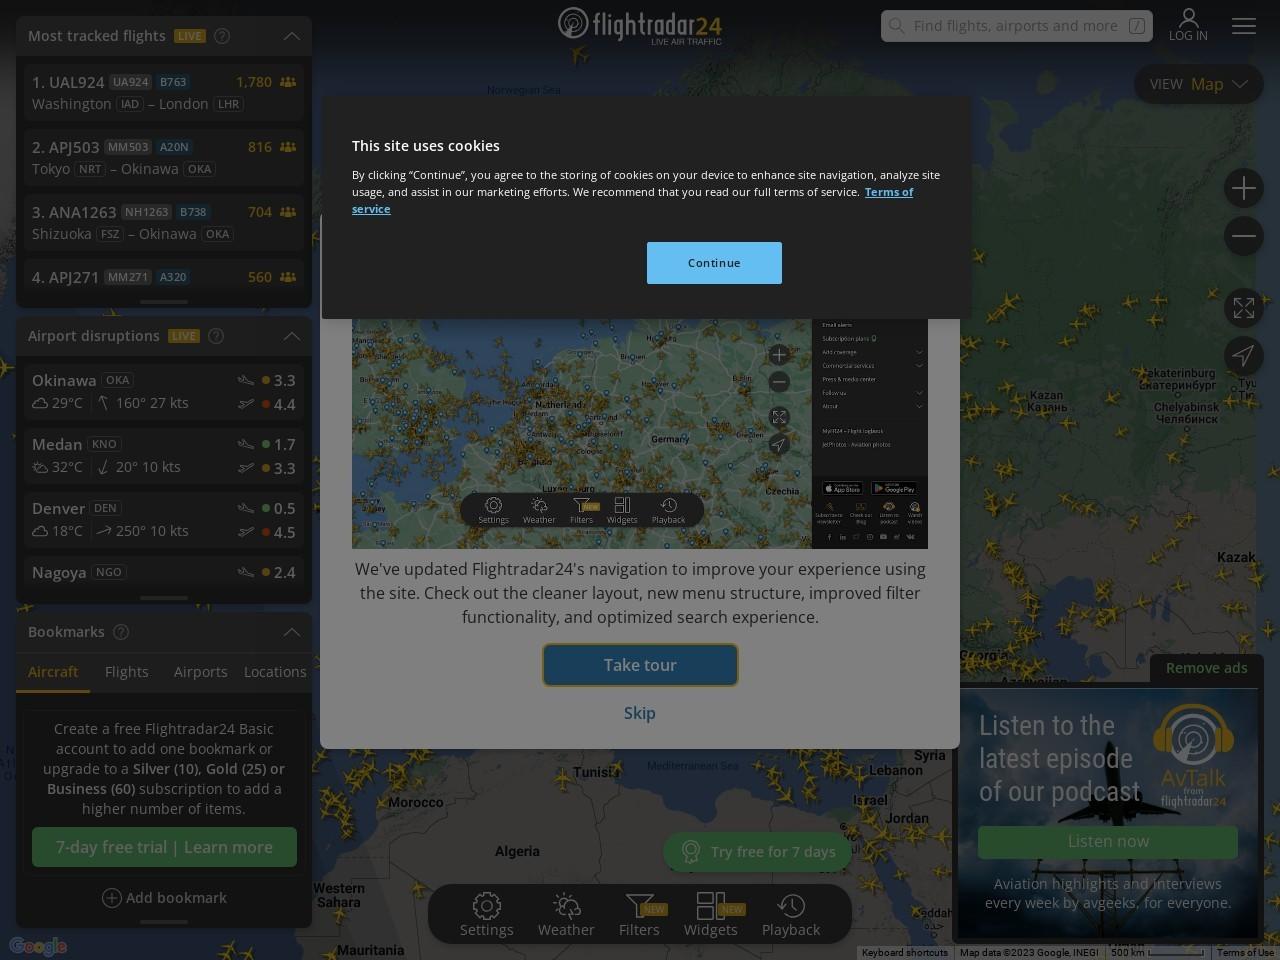 http://www.flightradar24.com/60,15/6